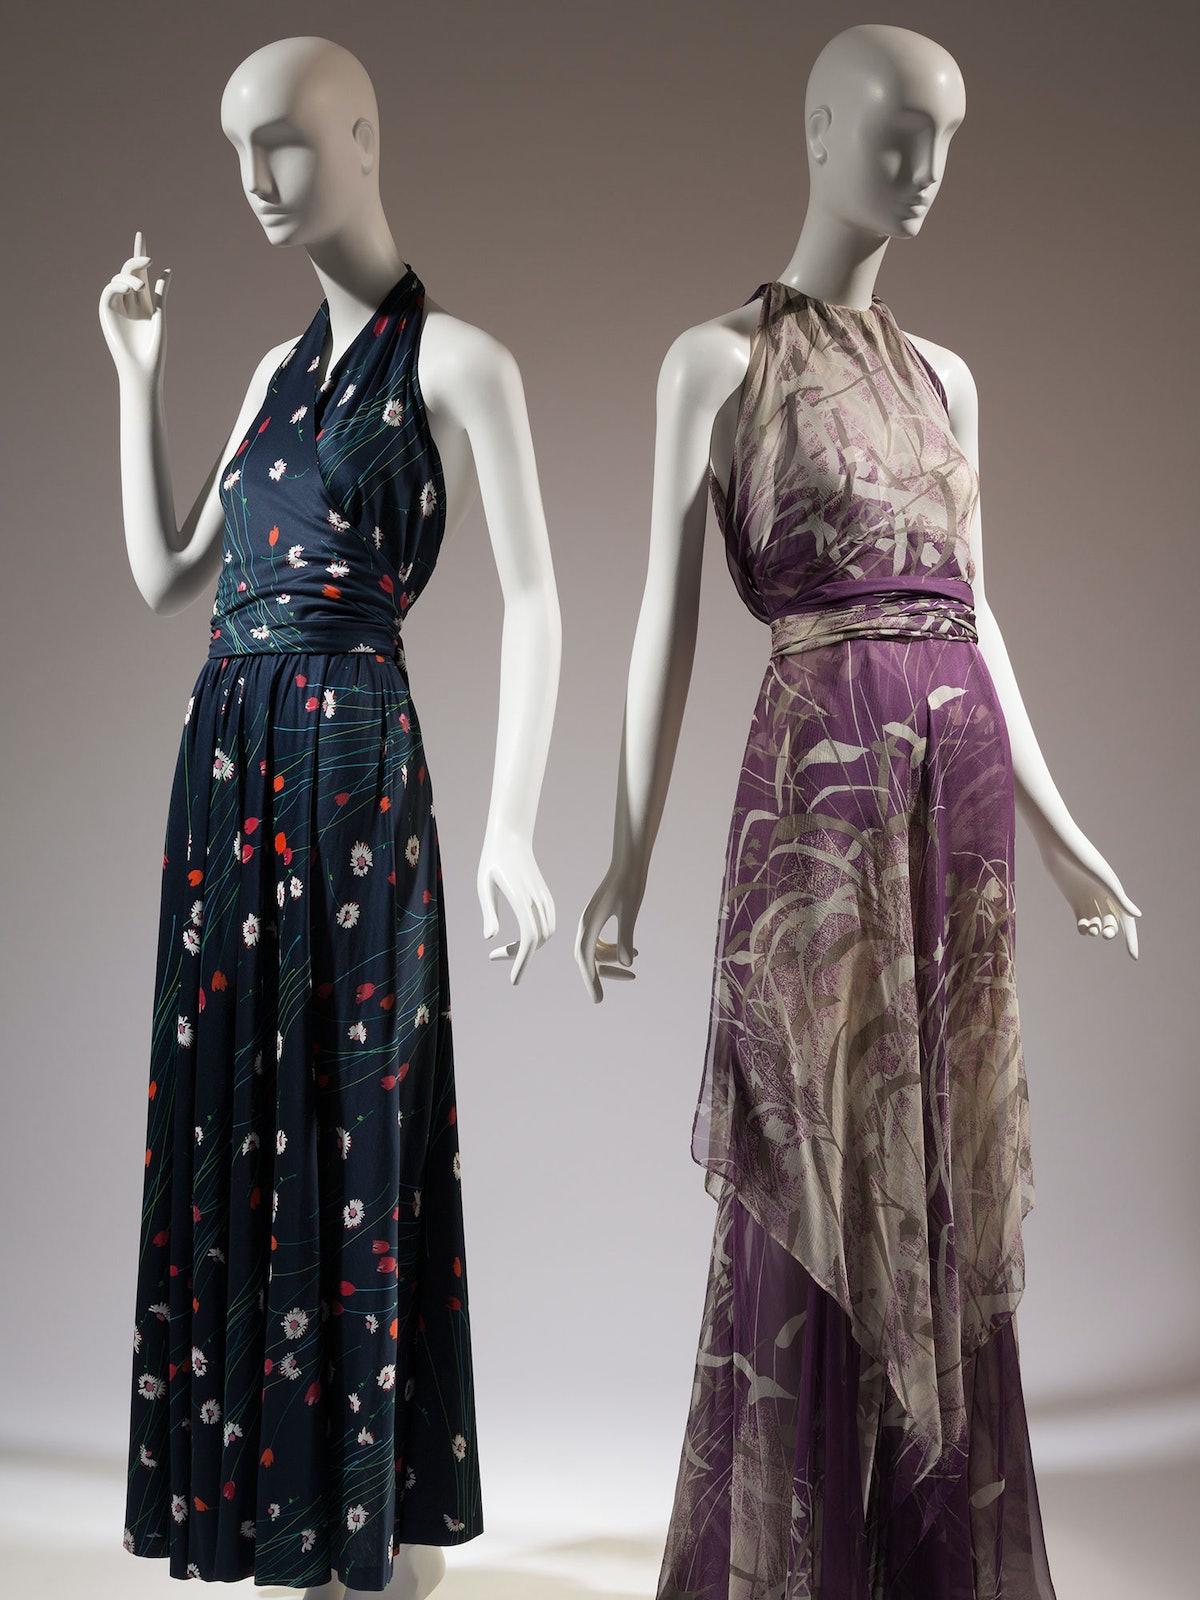 Halston printed knit cotton dress, c.1976, USA; and Yves Saint Laurent printed silk chiffon dress, 1971, France